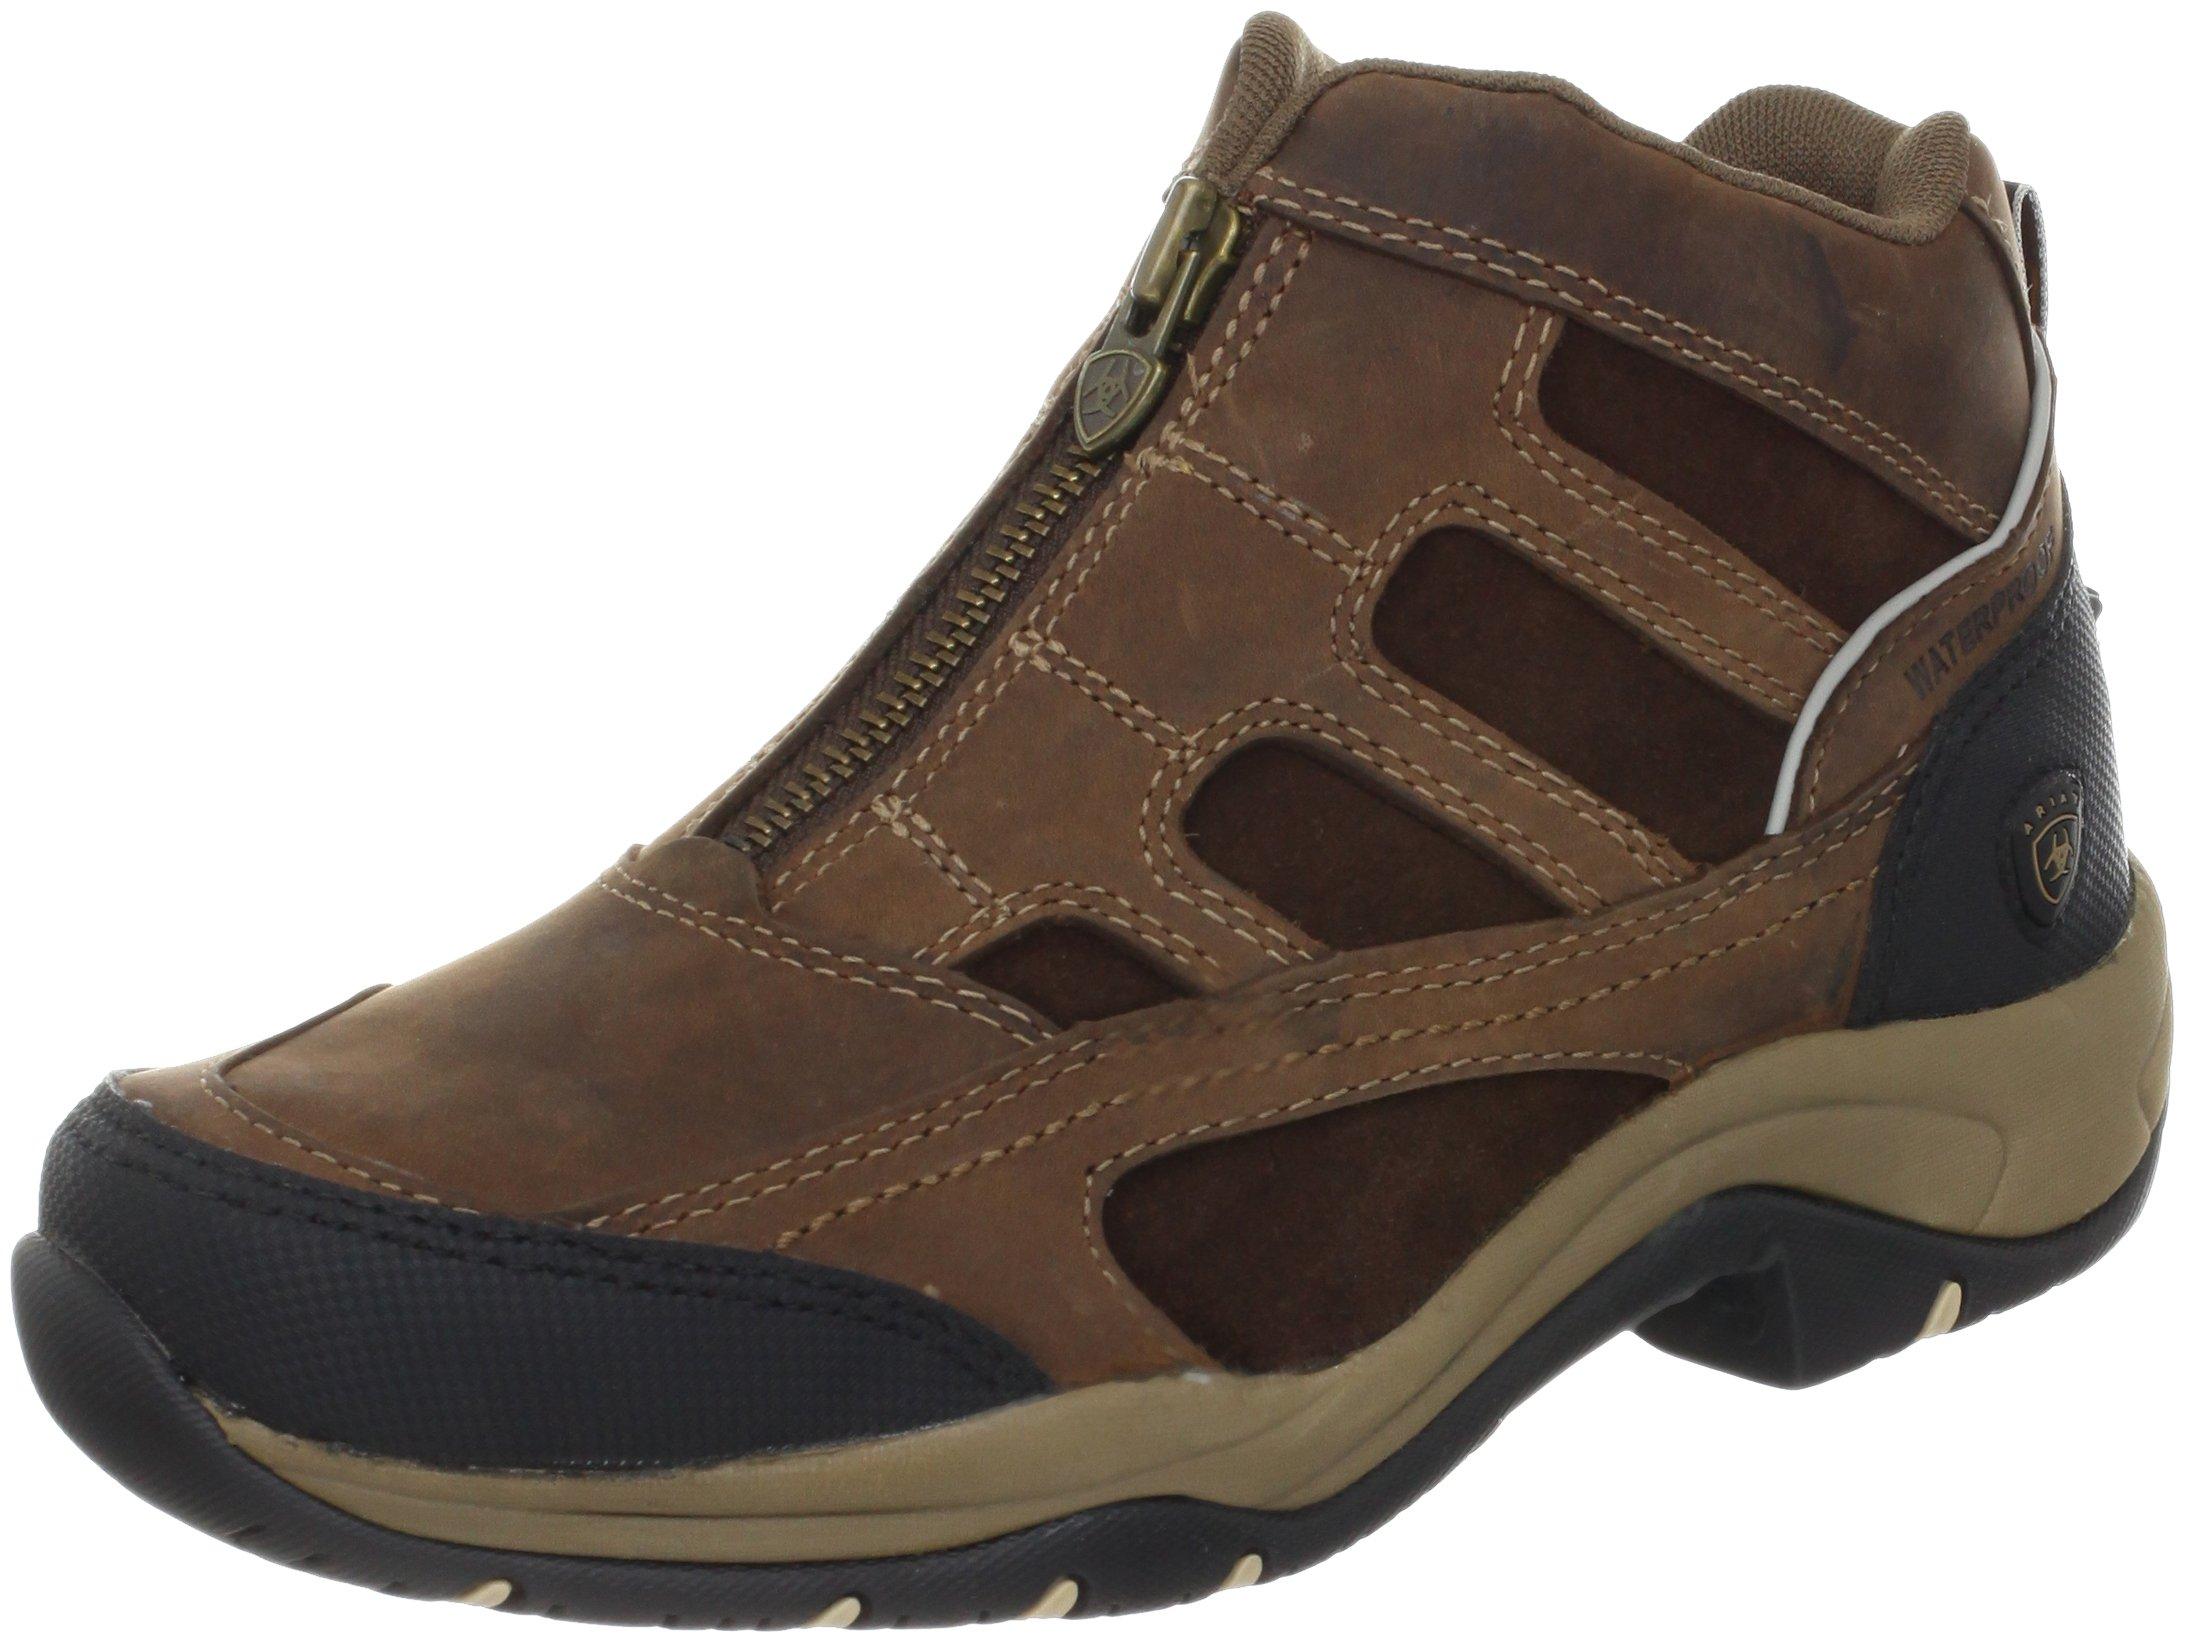 Ariat Women's Terrain Zip H2O Hiking Boot, Distressed Brown,9 B US